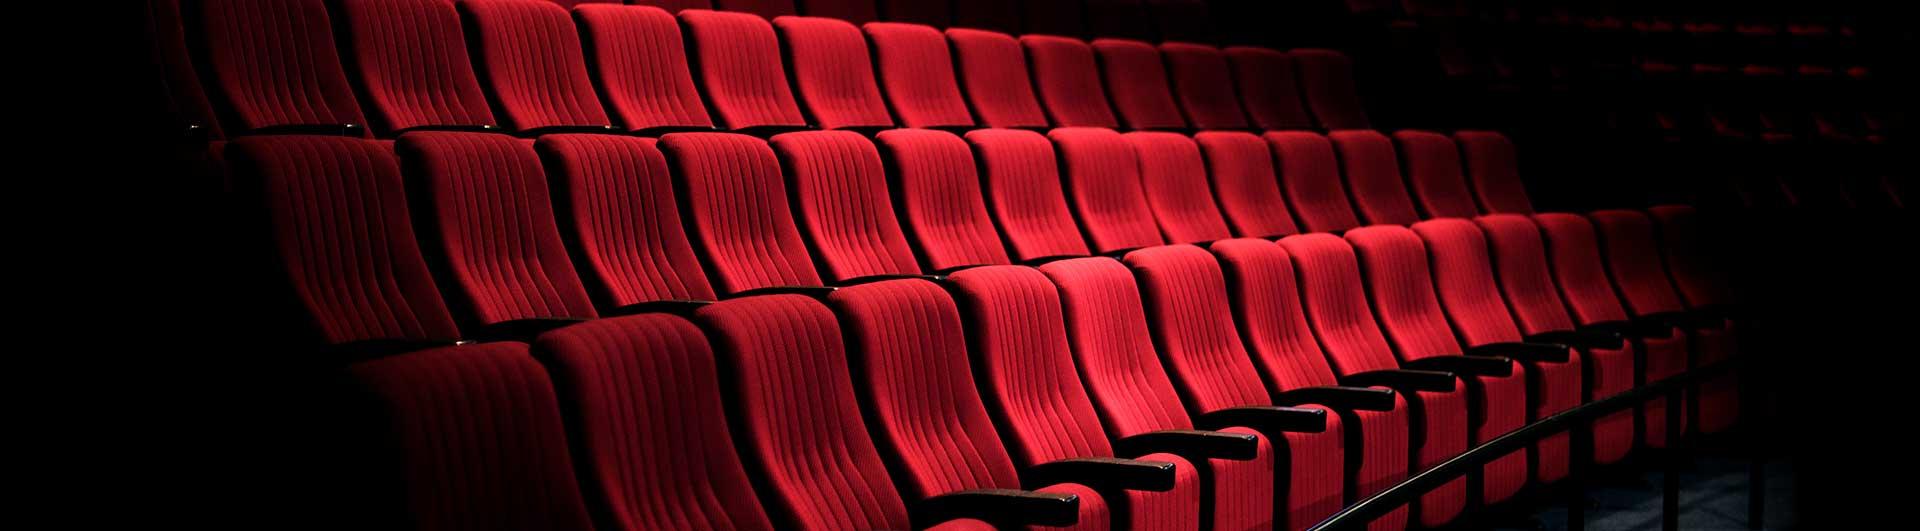 سینما ساویز کرج